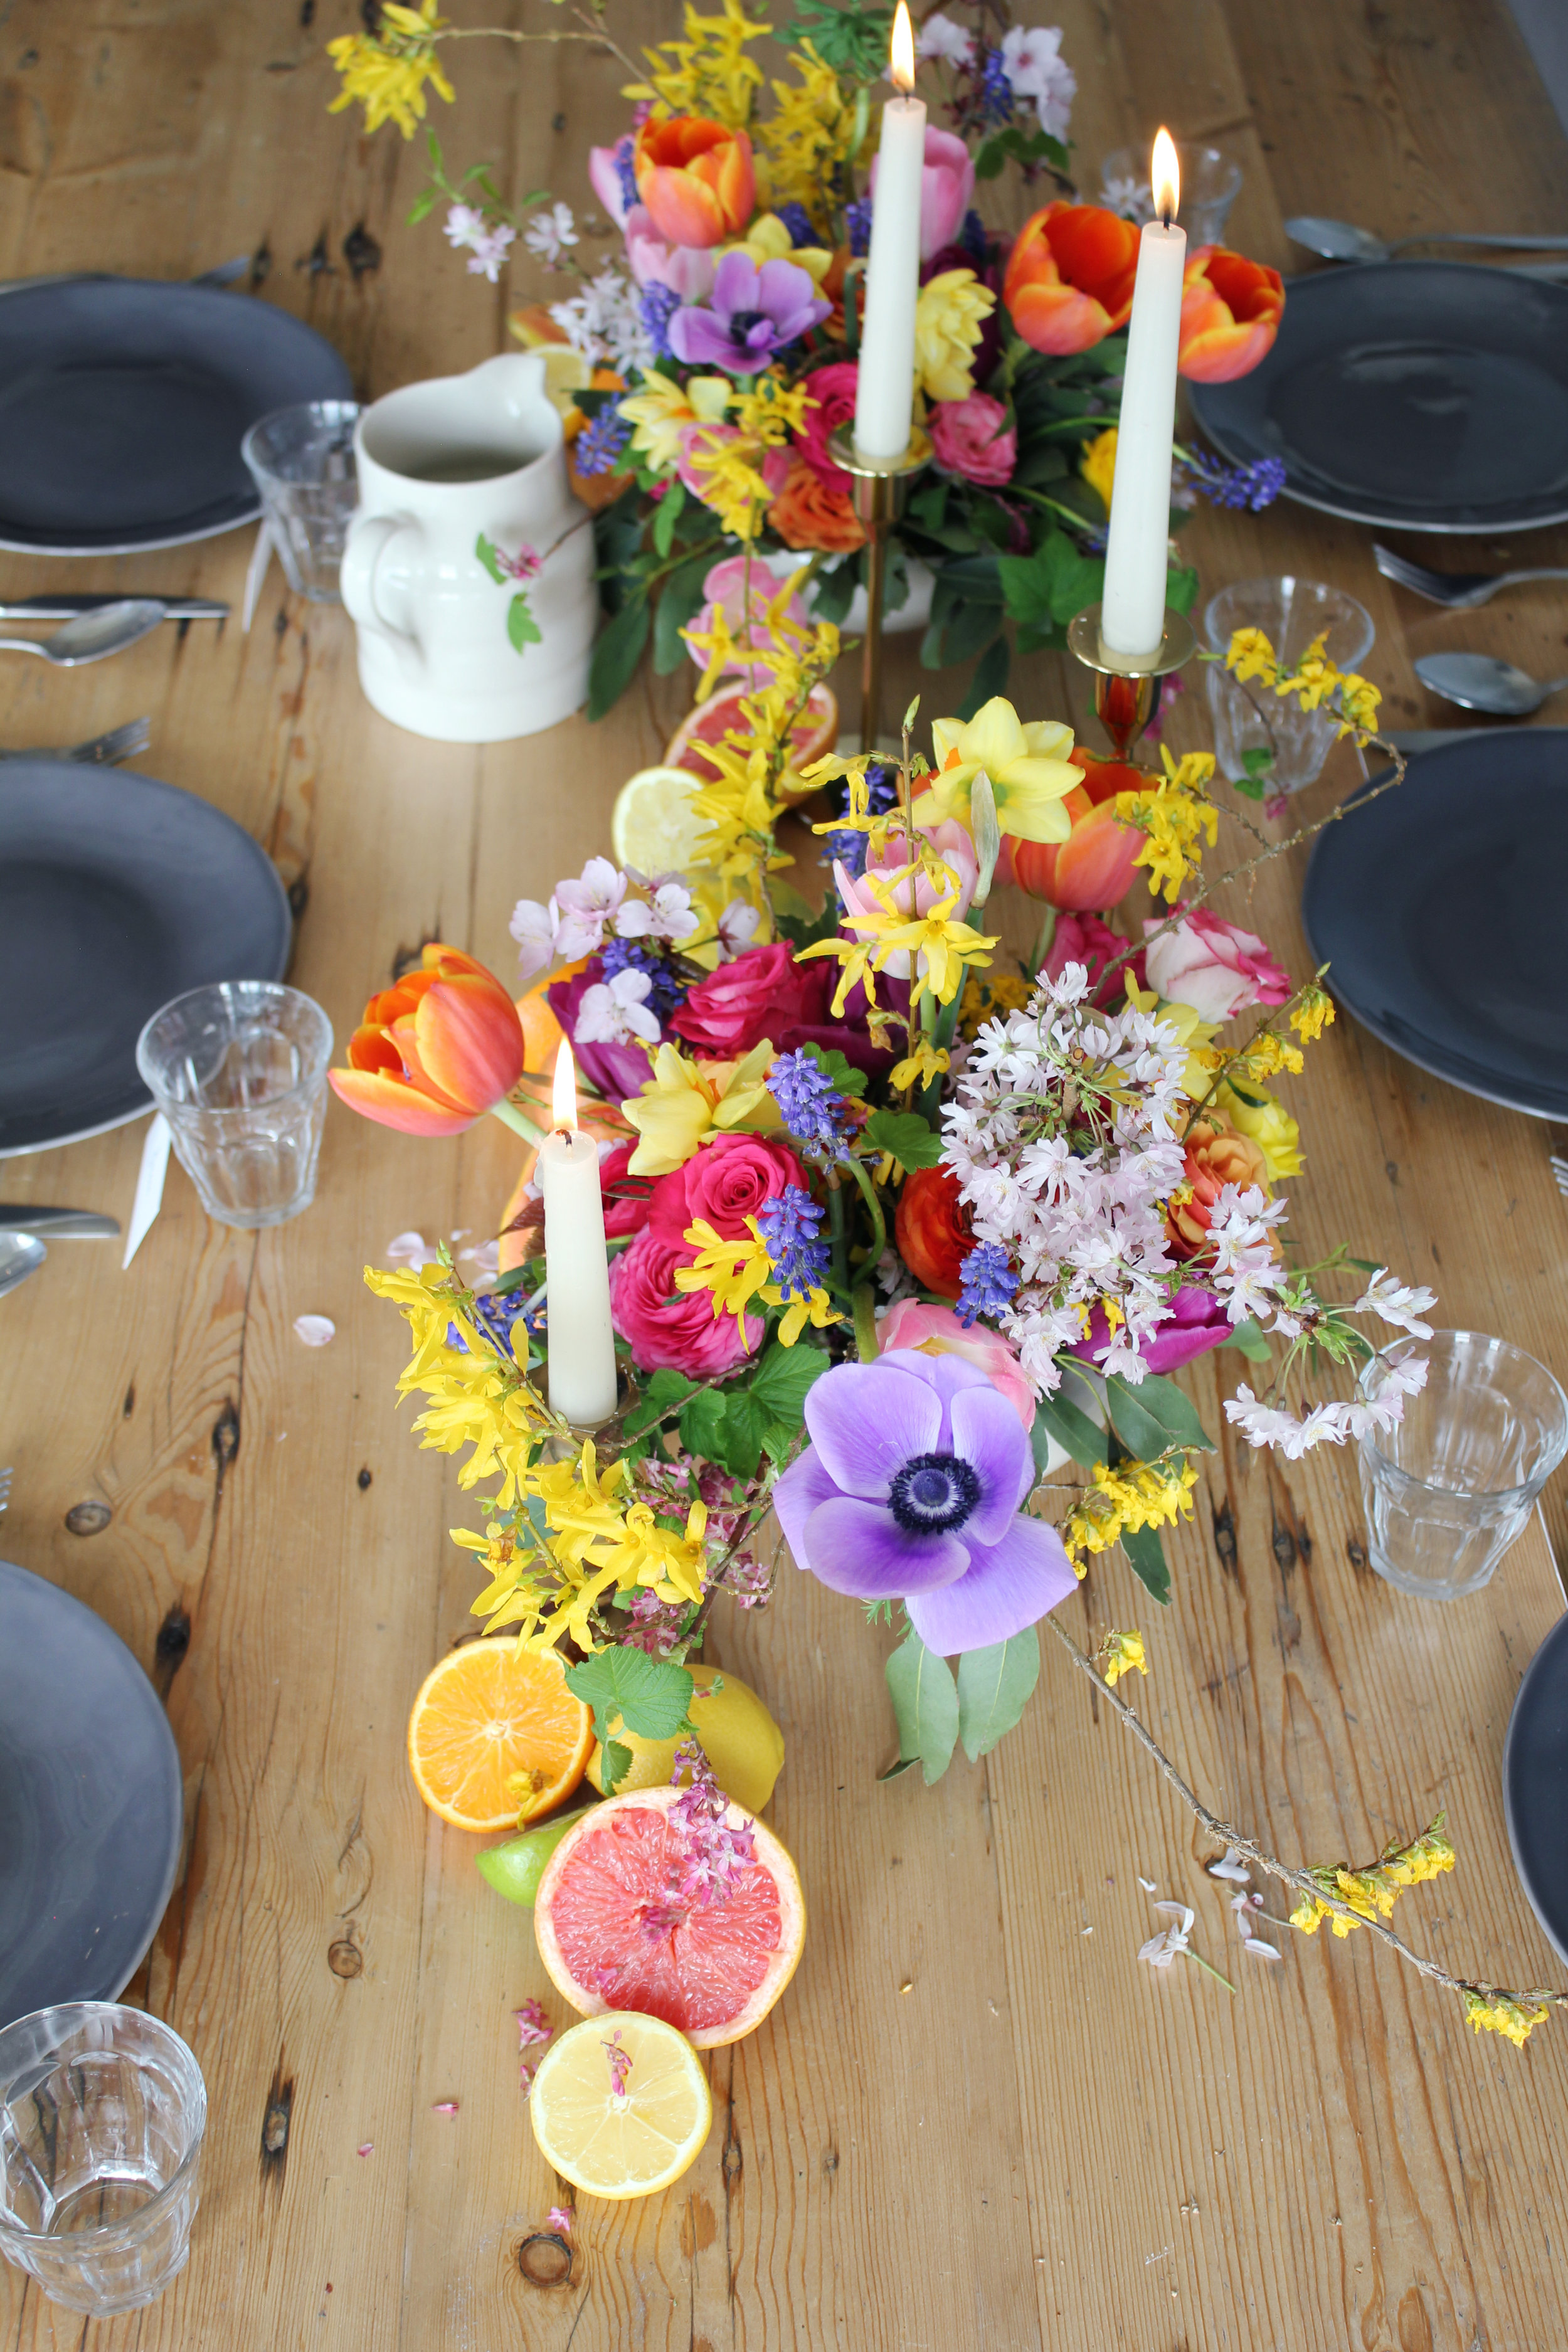 Callie-Pettigrew-Fruity-Florals-11.jpg